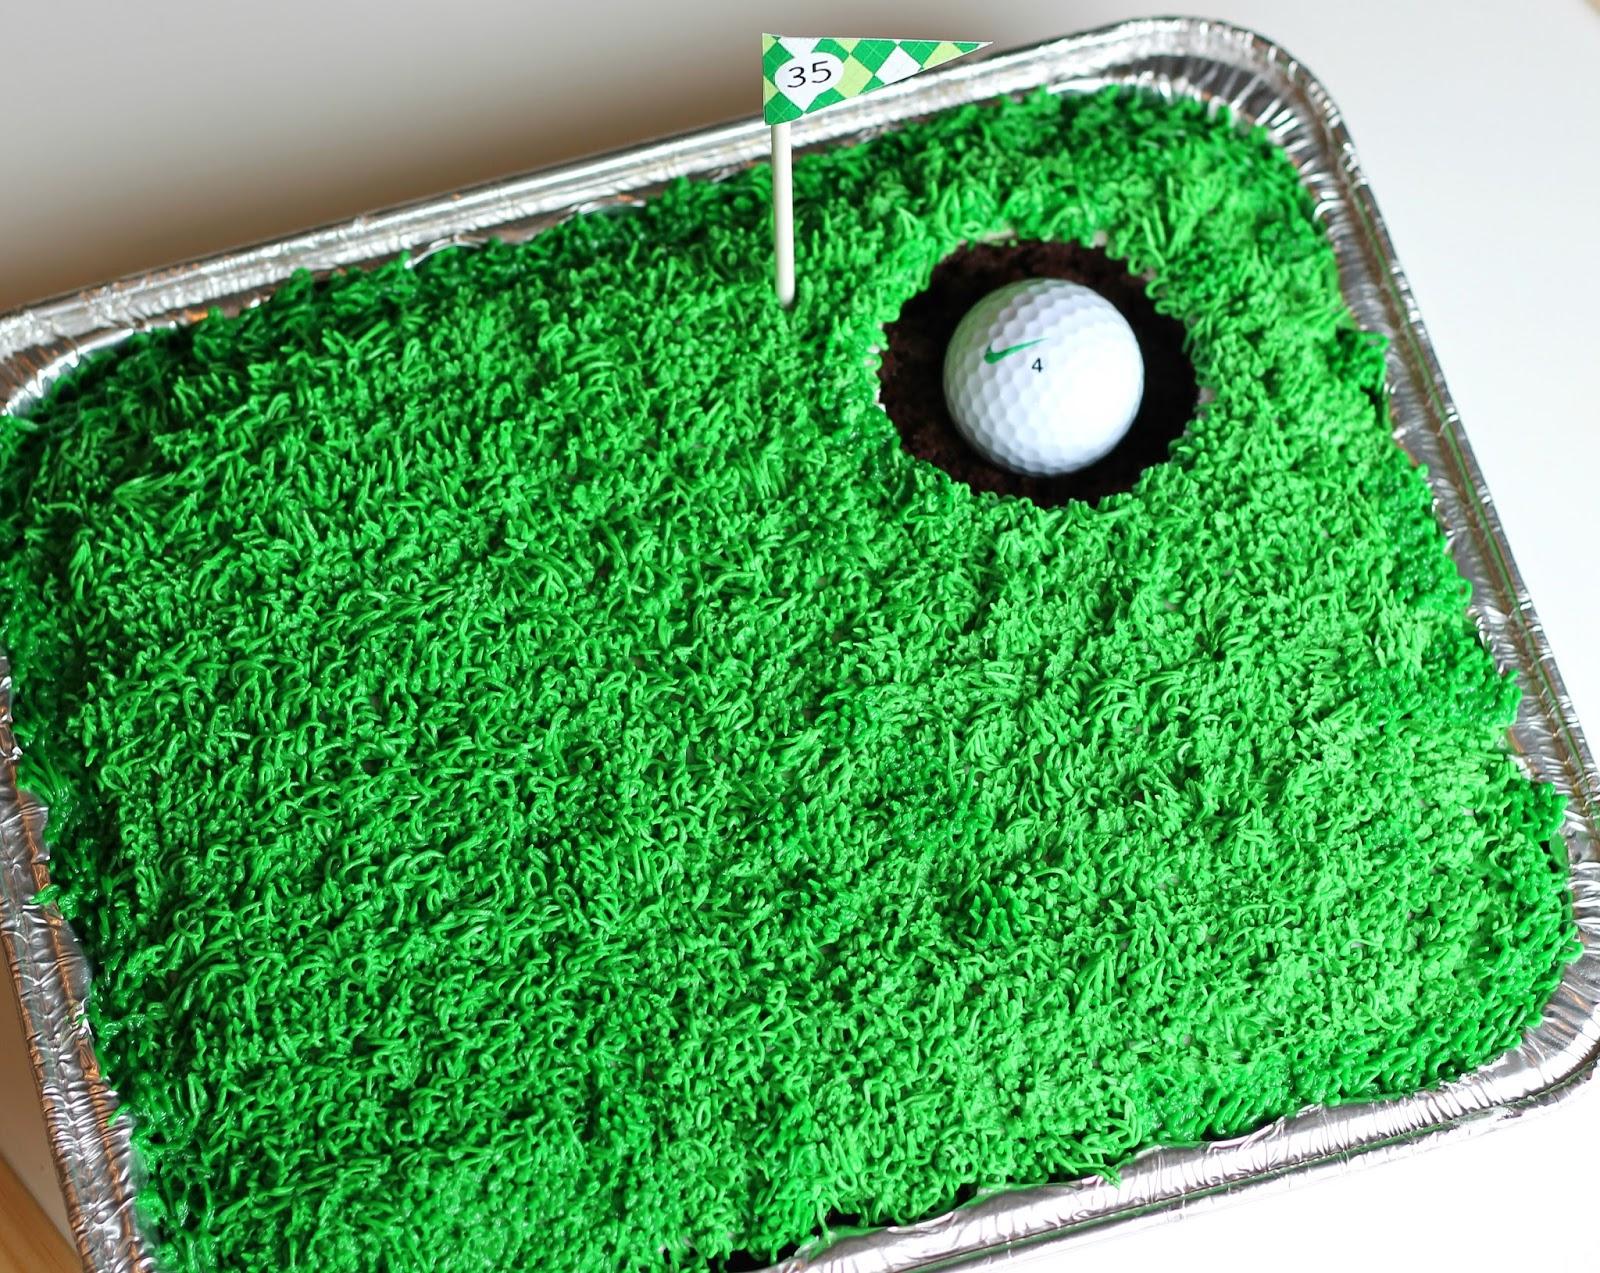 The Golfer Cake